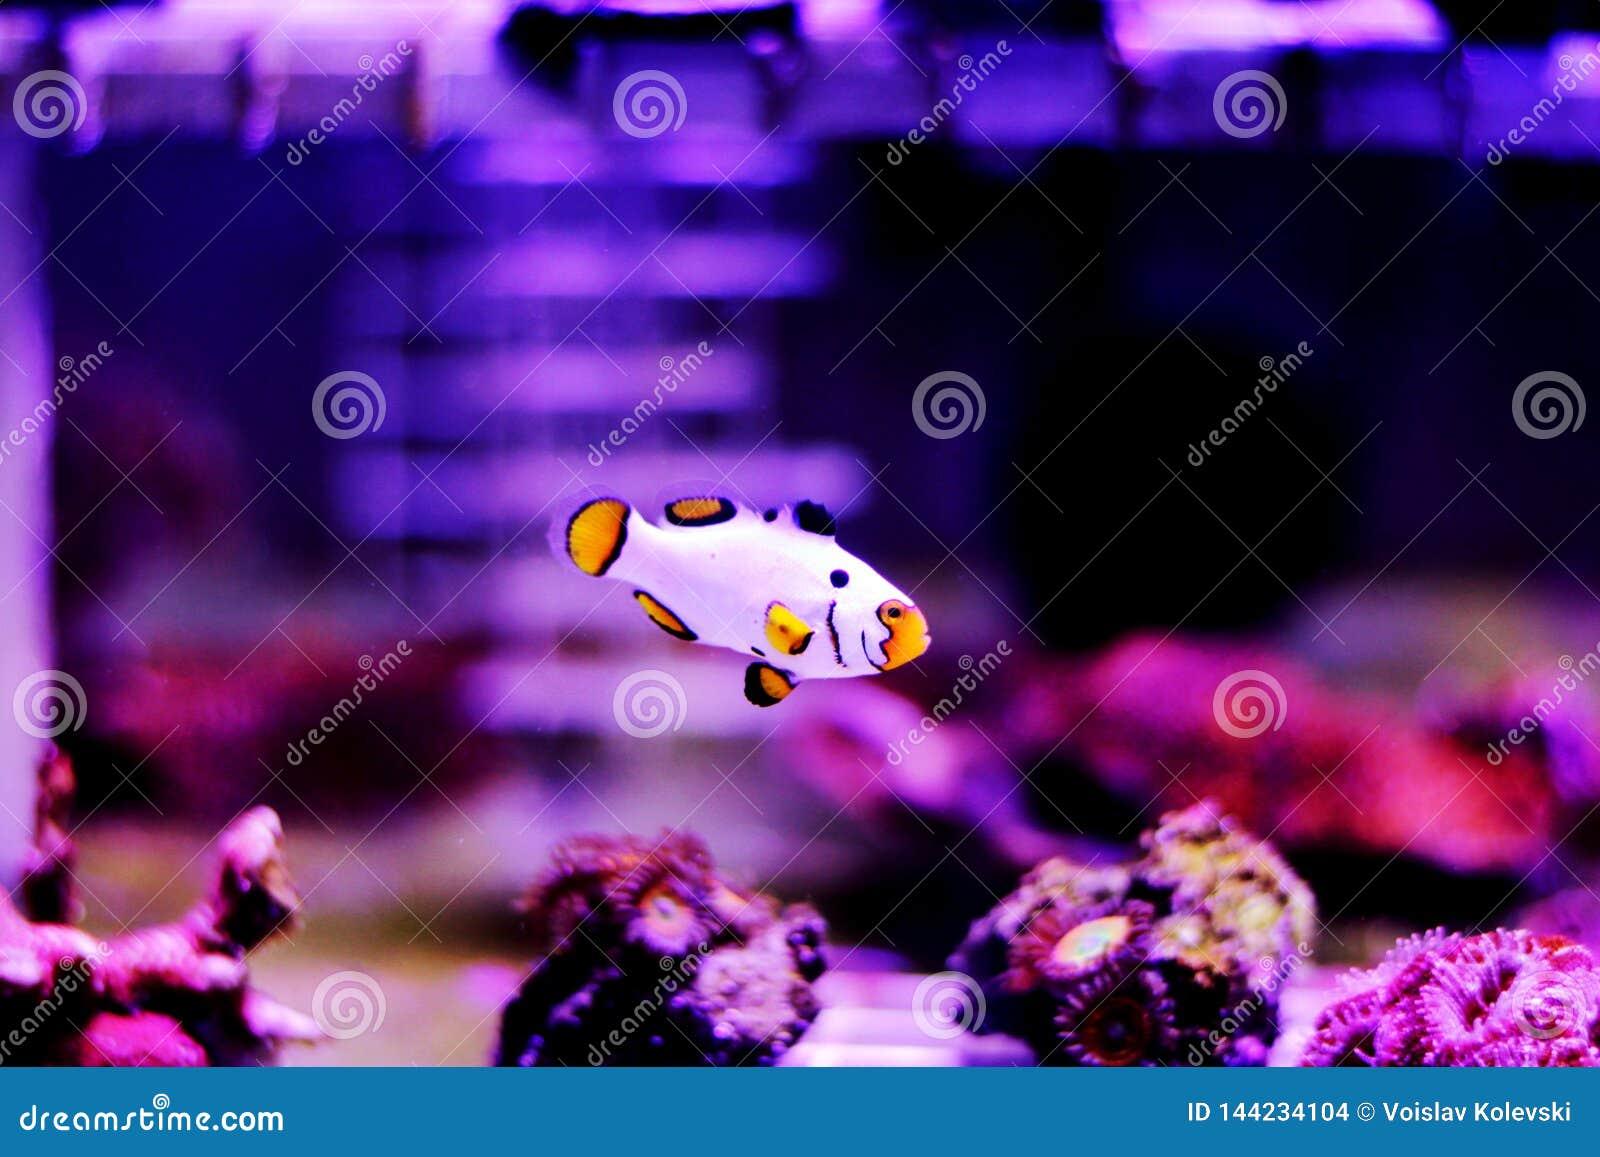 Hodujących Krańcowych Śnieżnych Onyksowych Clownfish, Amphriprion ocellaris x Amphriprion percula -